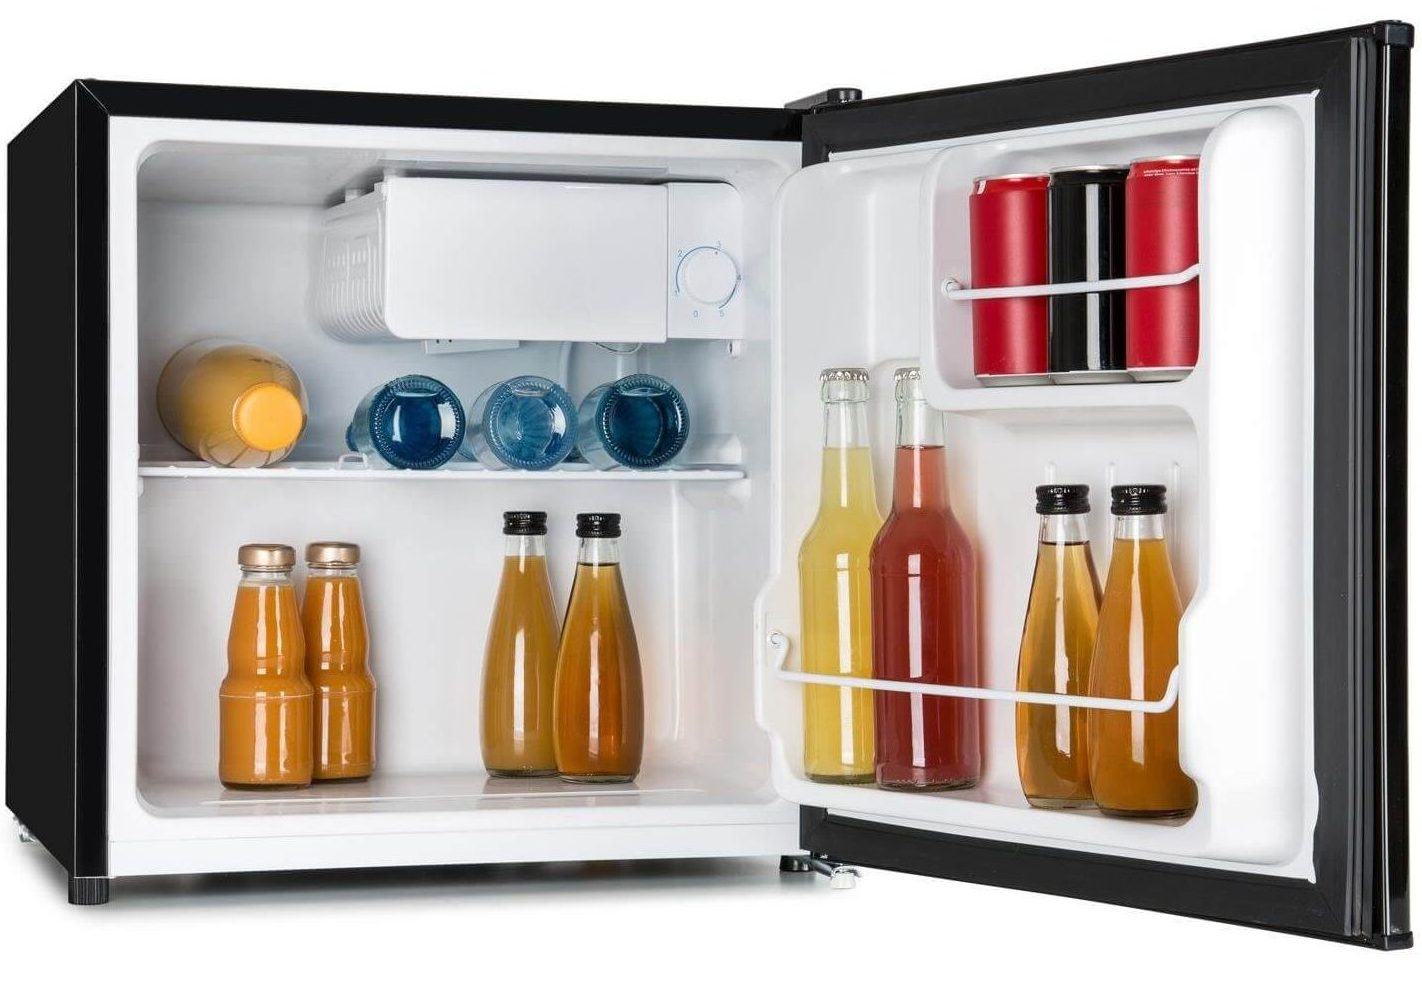 Klarstein Spitzbergen Aca Refrigerator Cooler